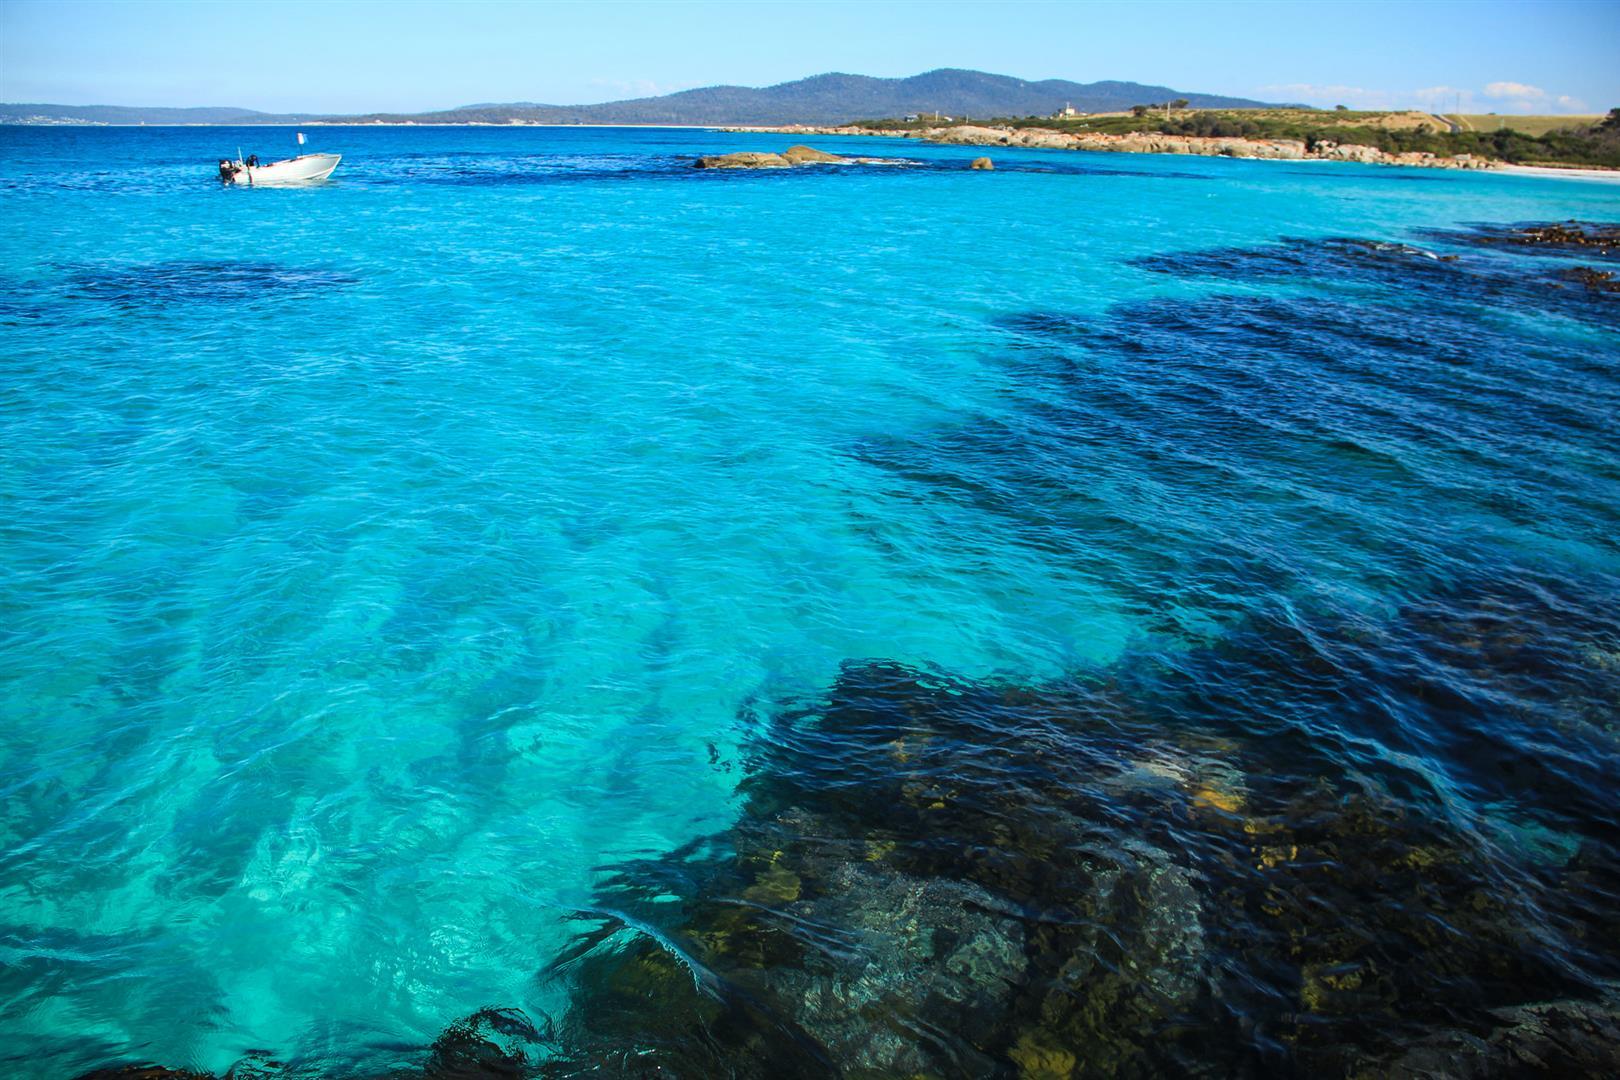 oceano azul turquesa na tasmania austrália